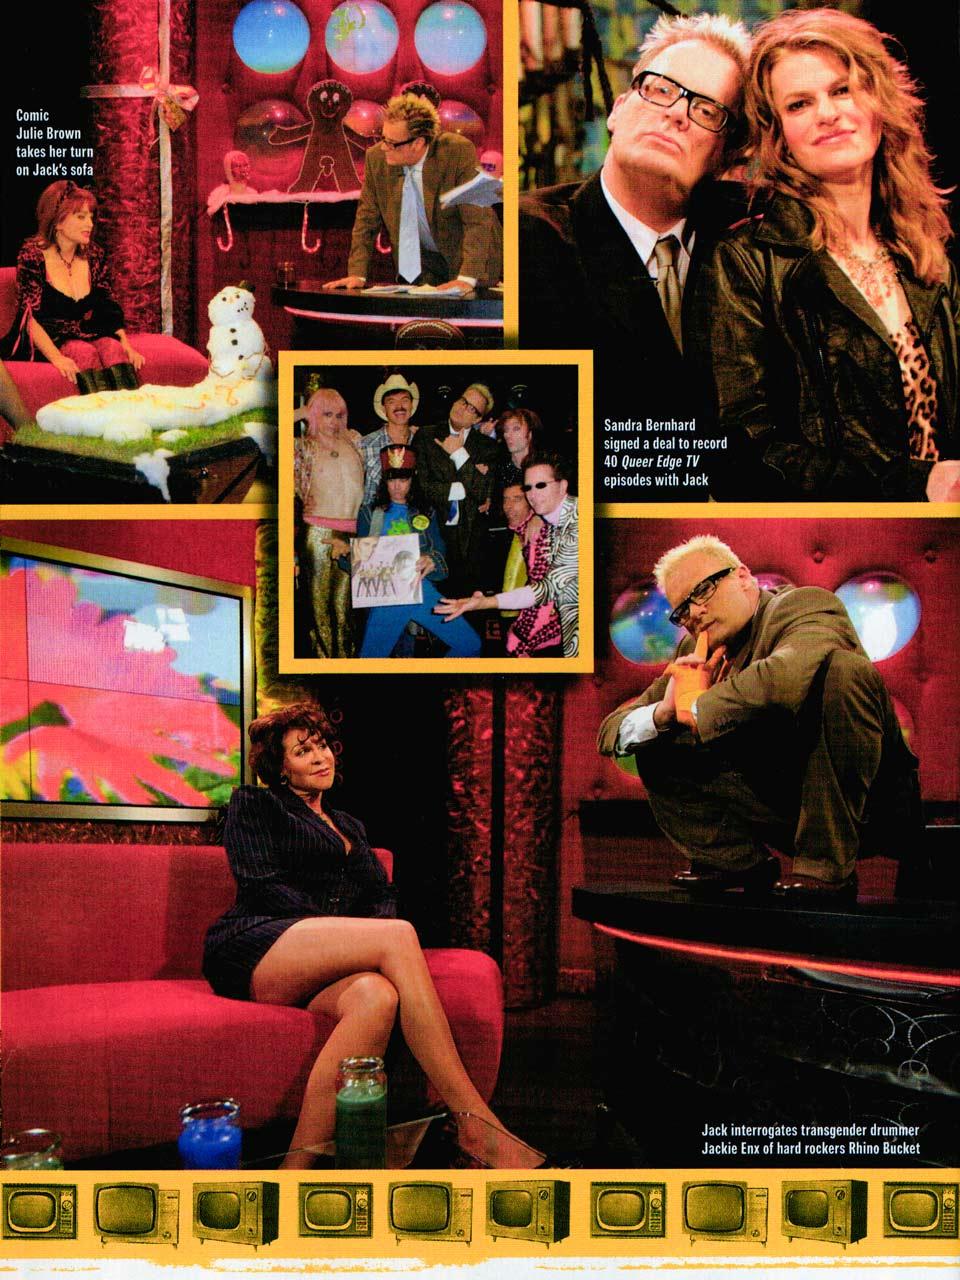 Bizarre magazine 2006 Jack E. Jett Lenora Claire